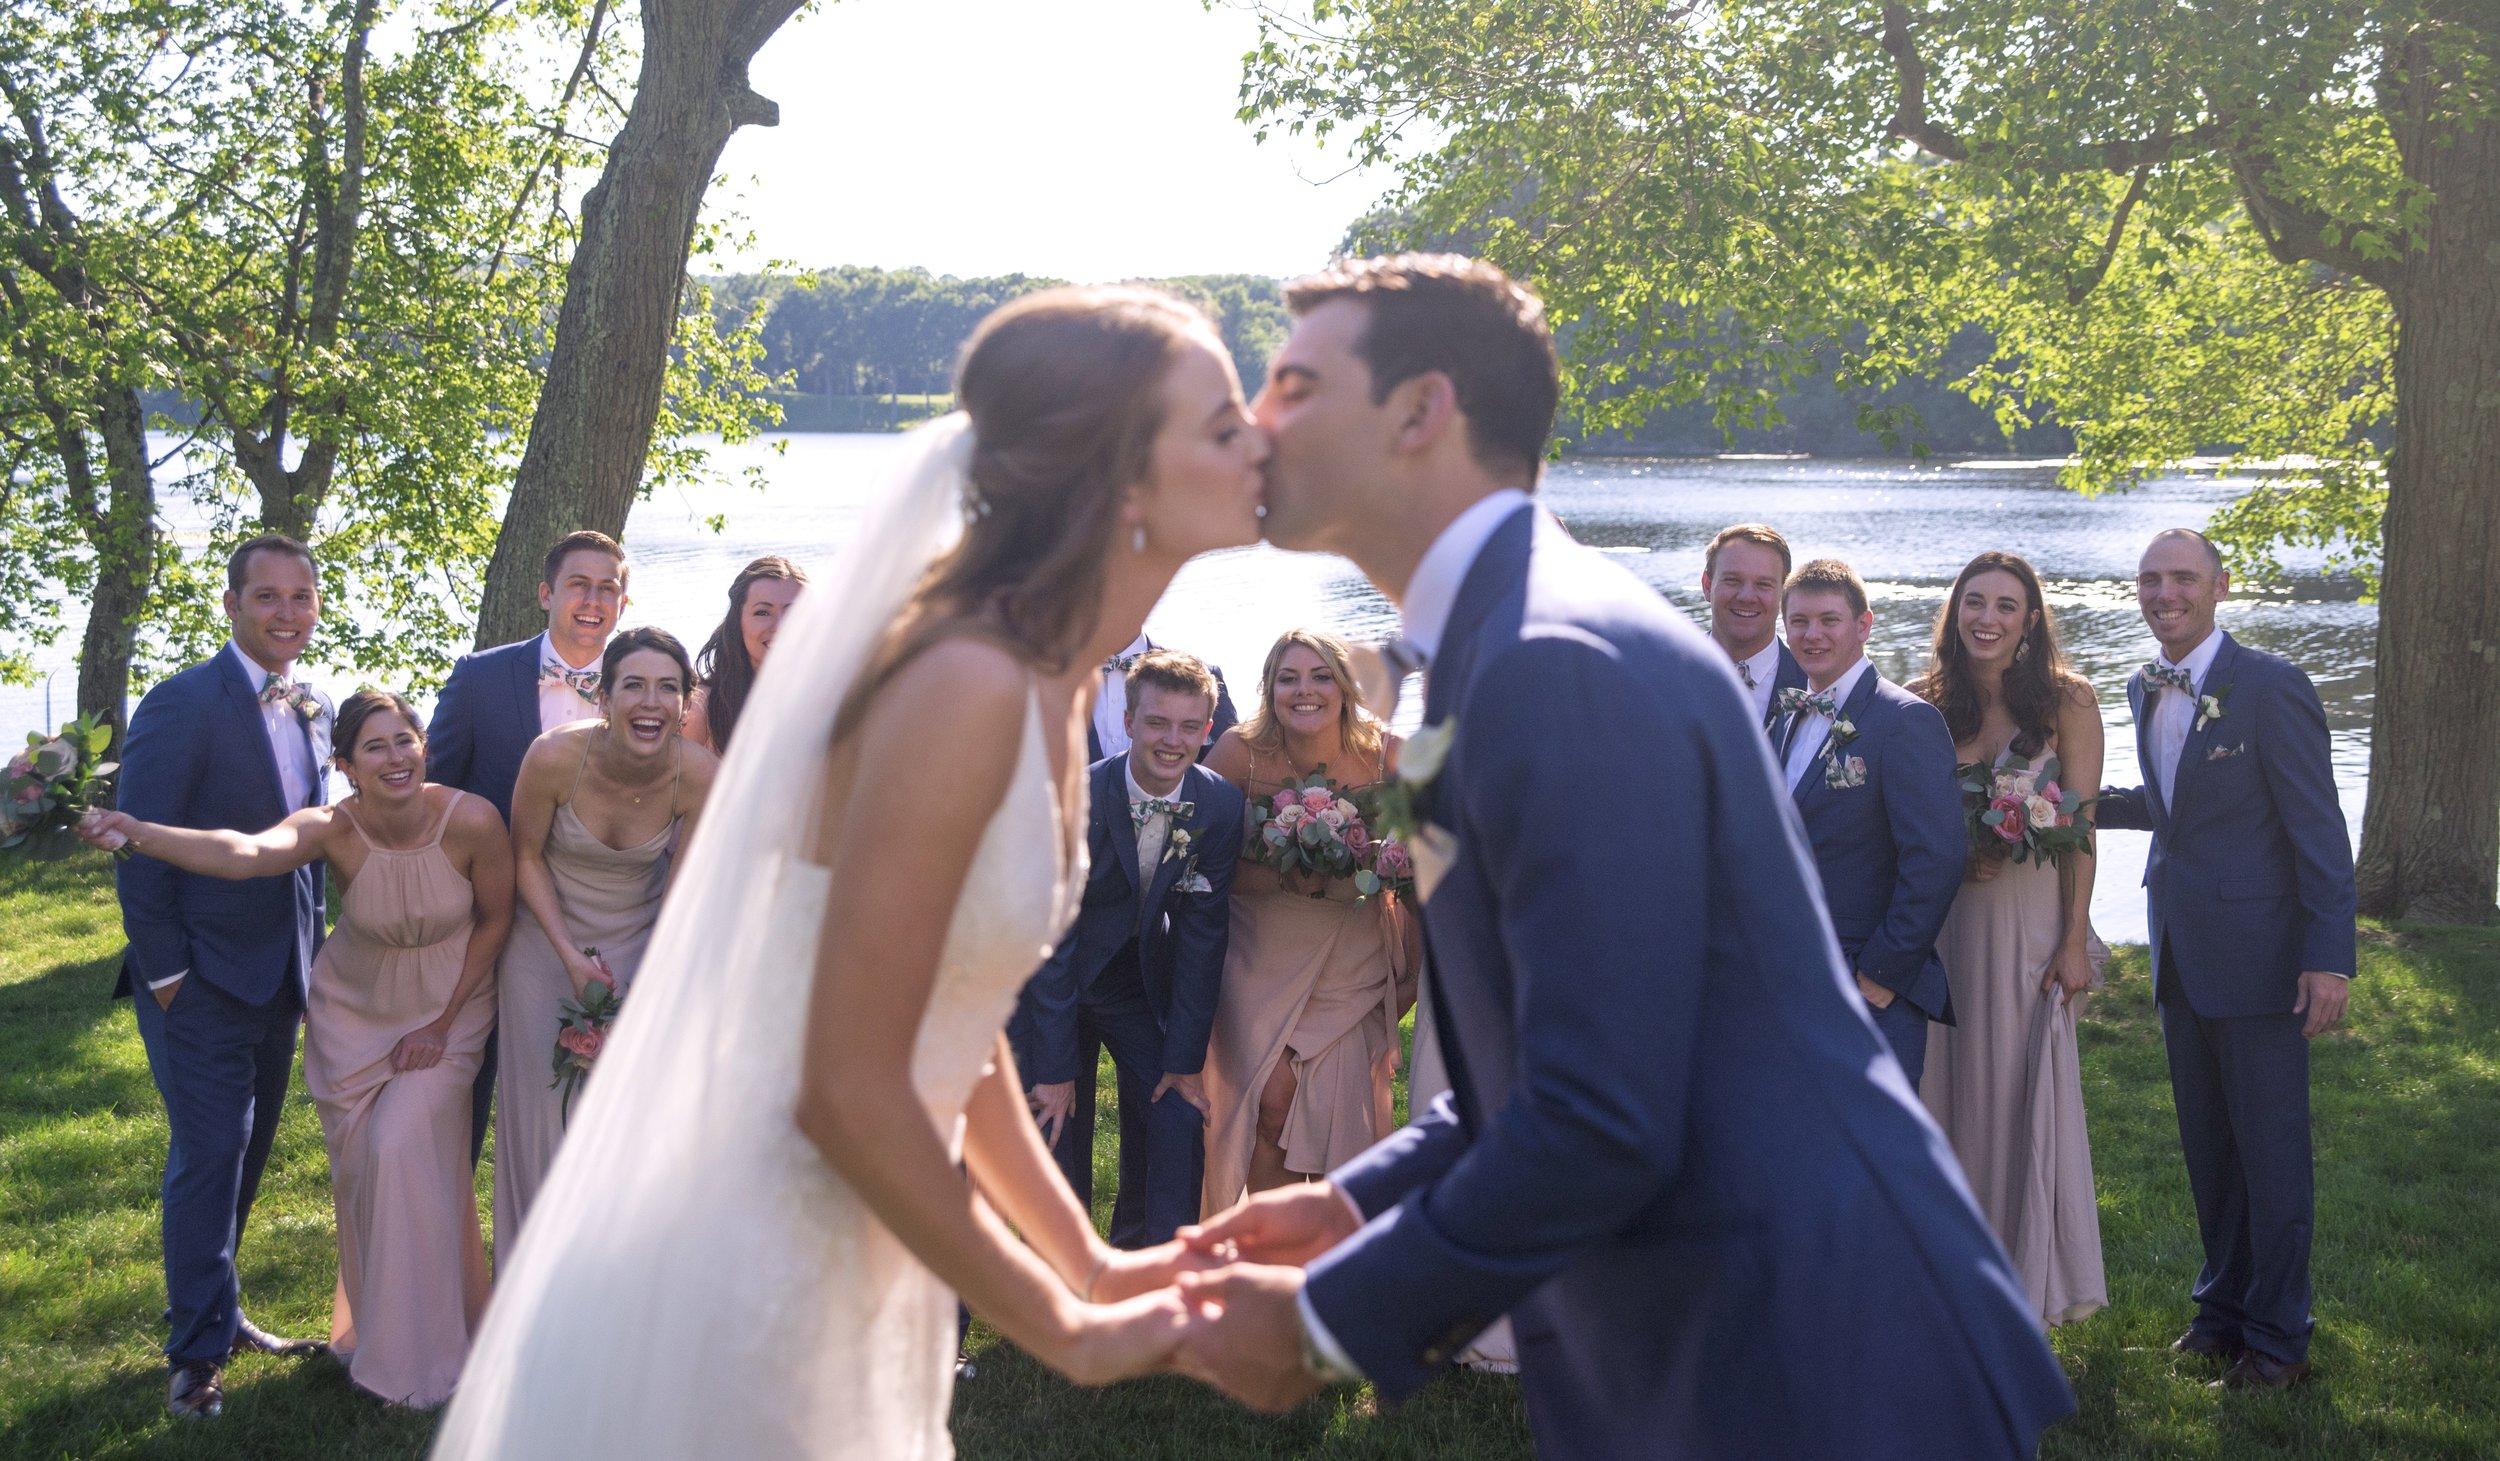 Kelsie & Nicholas wedding by Unveiled-Weddings.com